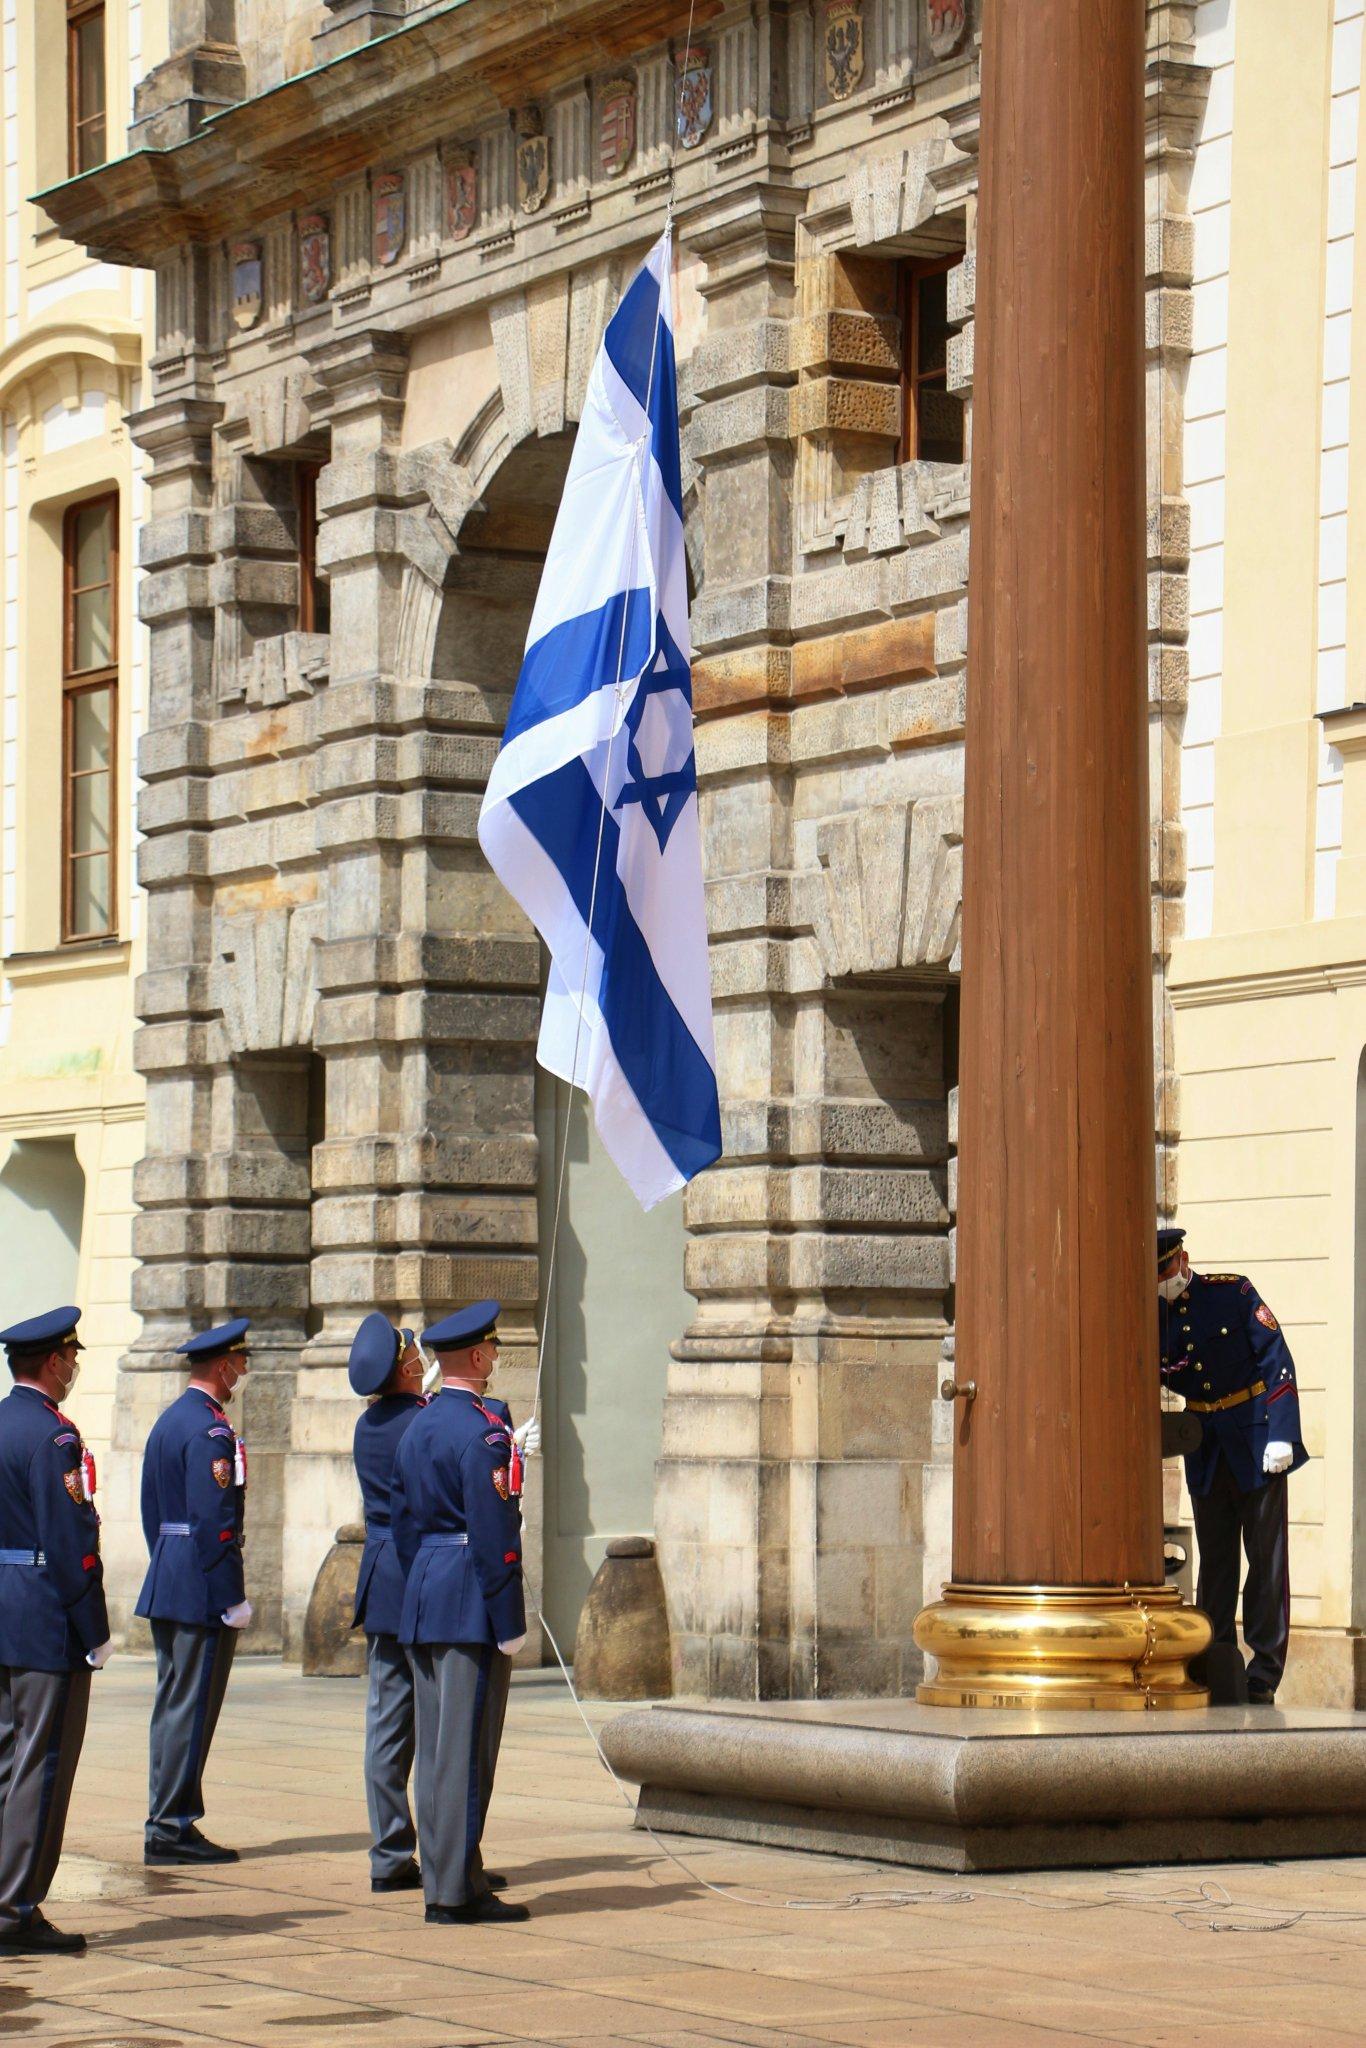 Pražský hrad – Kancelář prezidenta republiky on Twitter